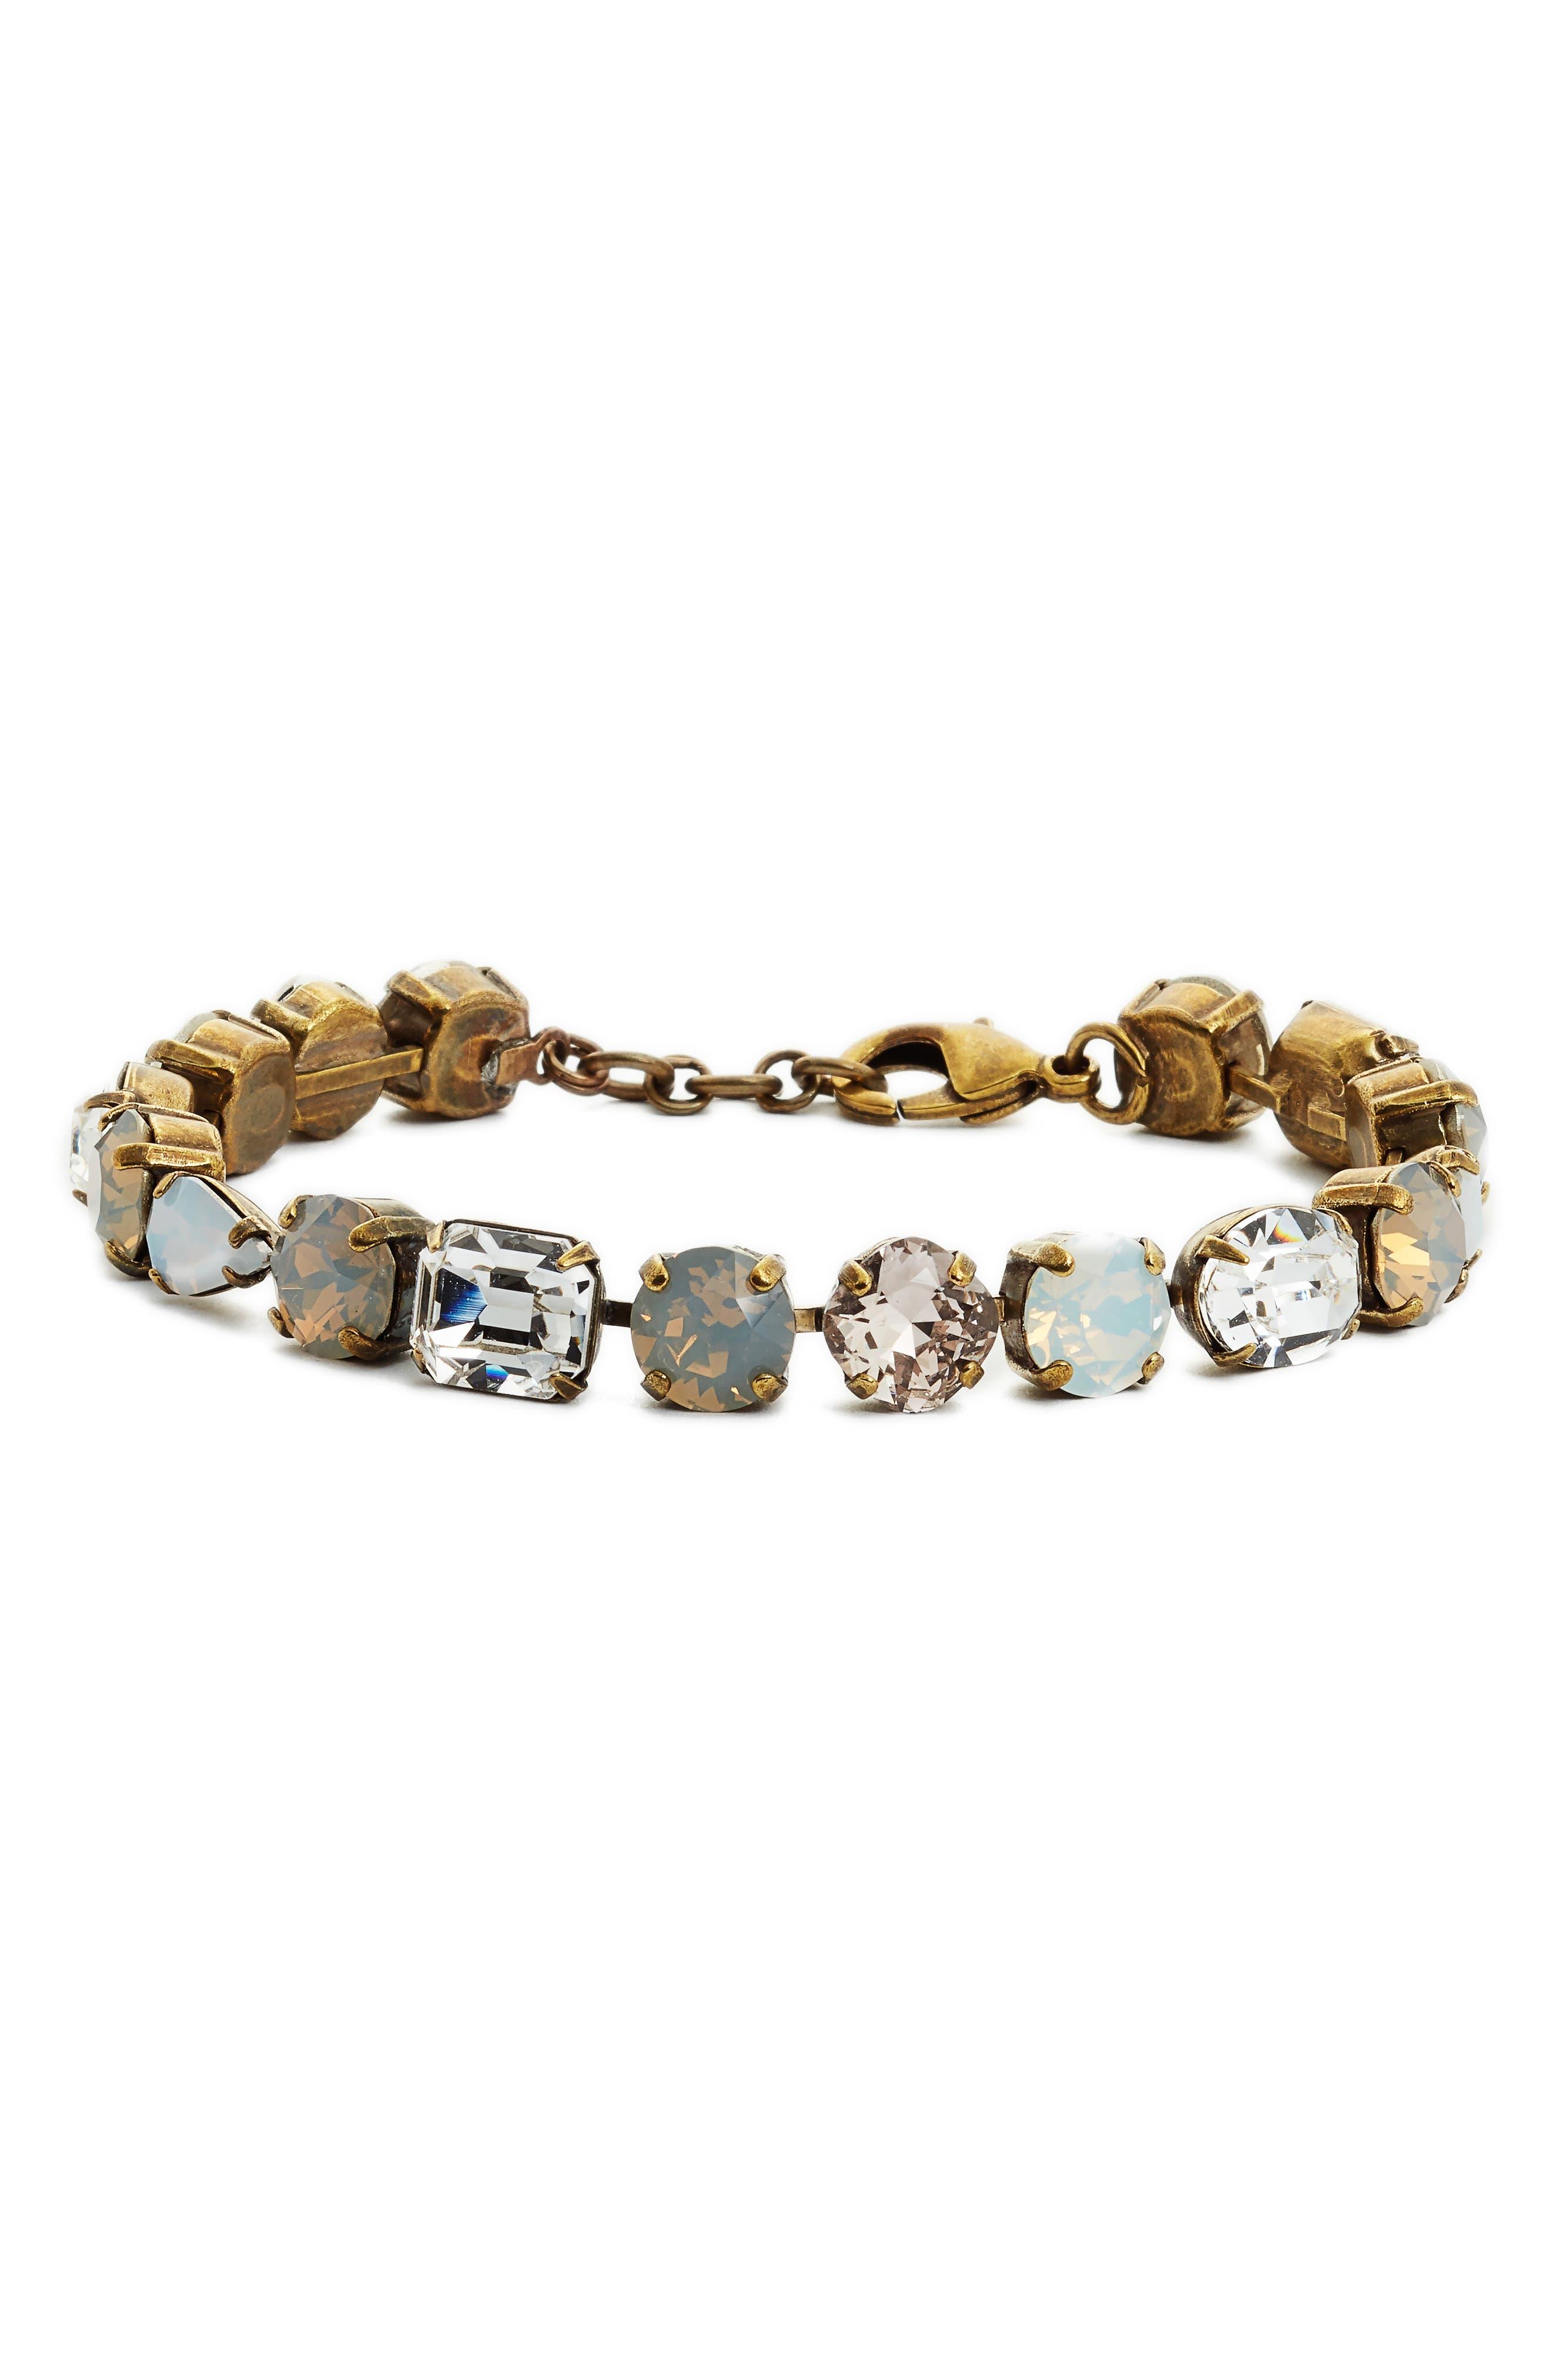 Clover Crystal Bracelet,                             Main thumbnail 1, color,                             Clear/ Gray